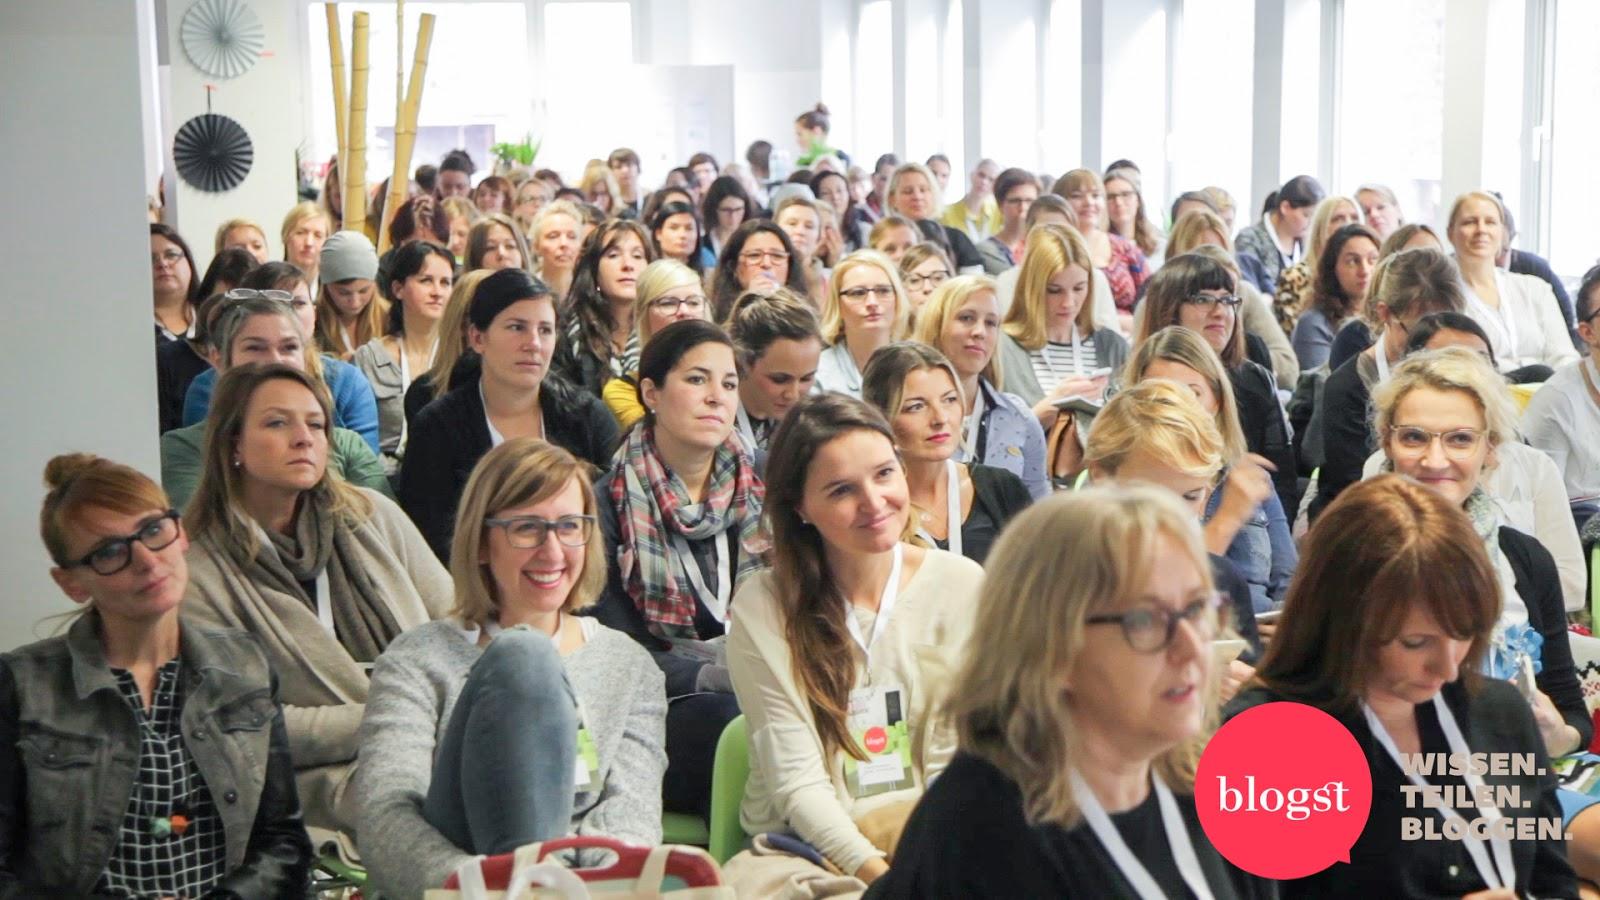 KuneCoco • Blogst 2015 • Bloggerkonferenz •  Foto by Christian Burmester